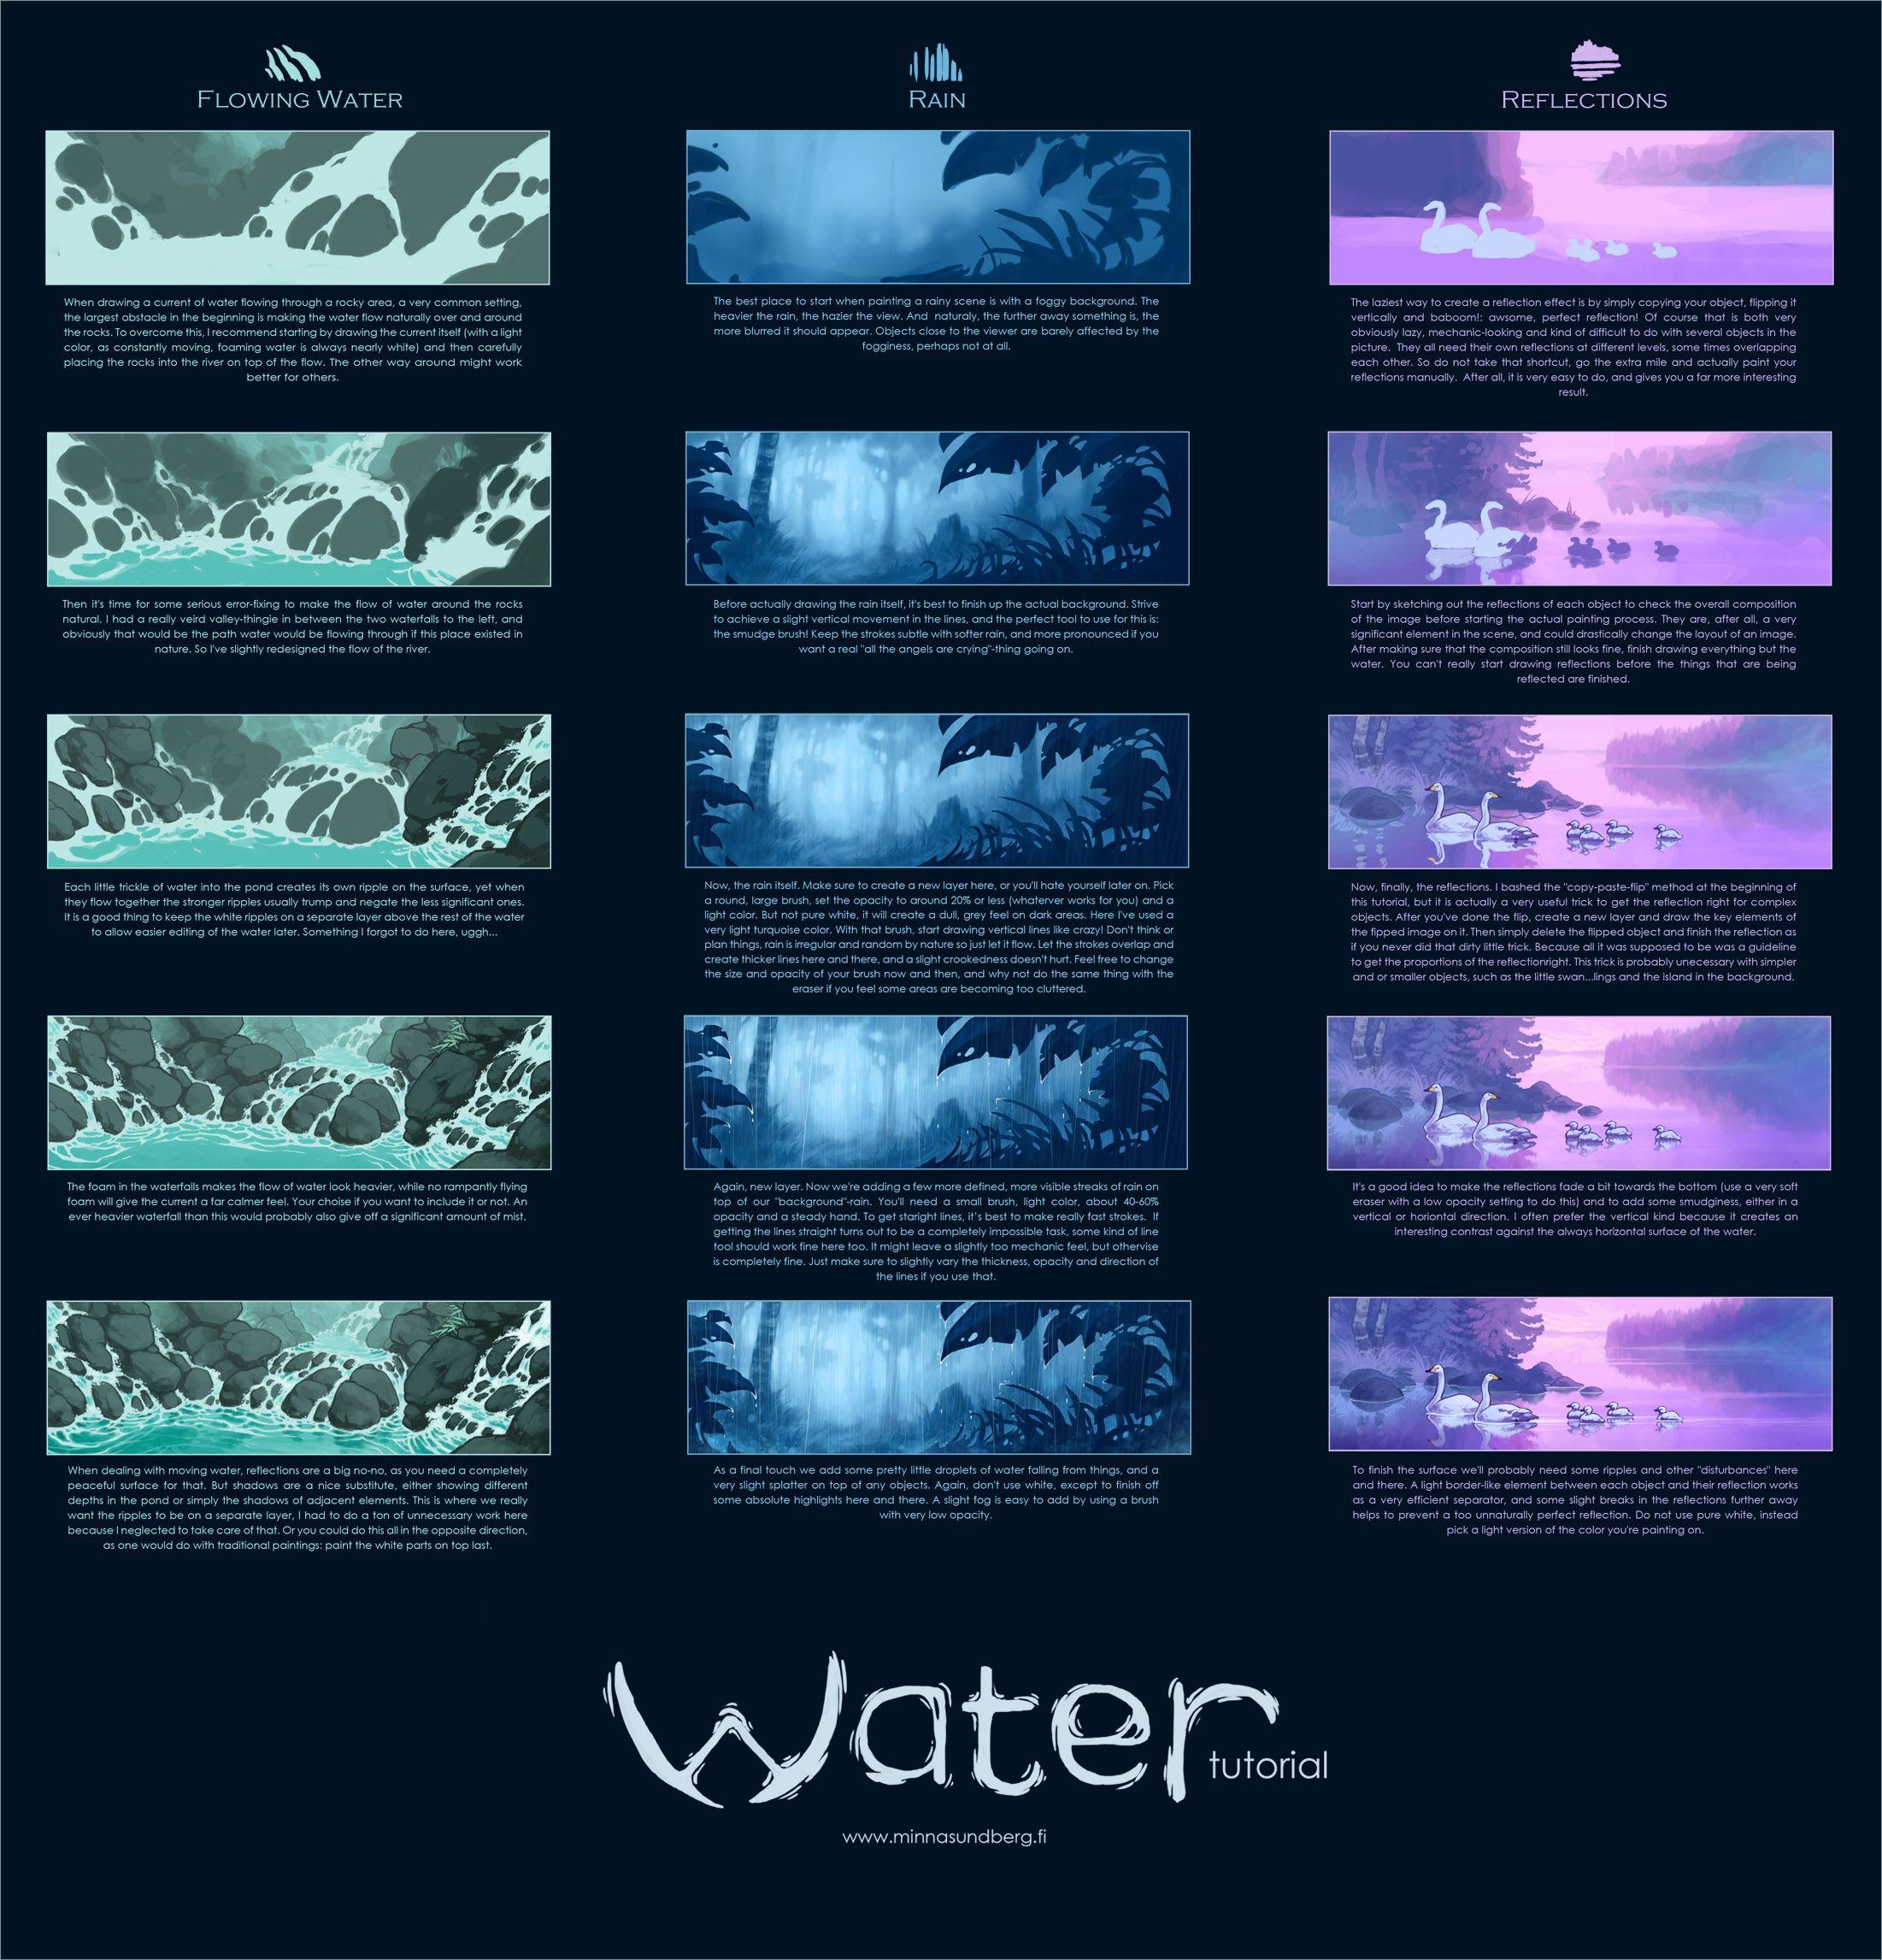 Digital painting art show_ ocean water youtube.